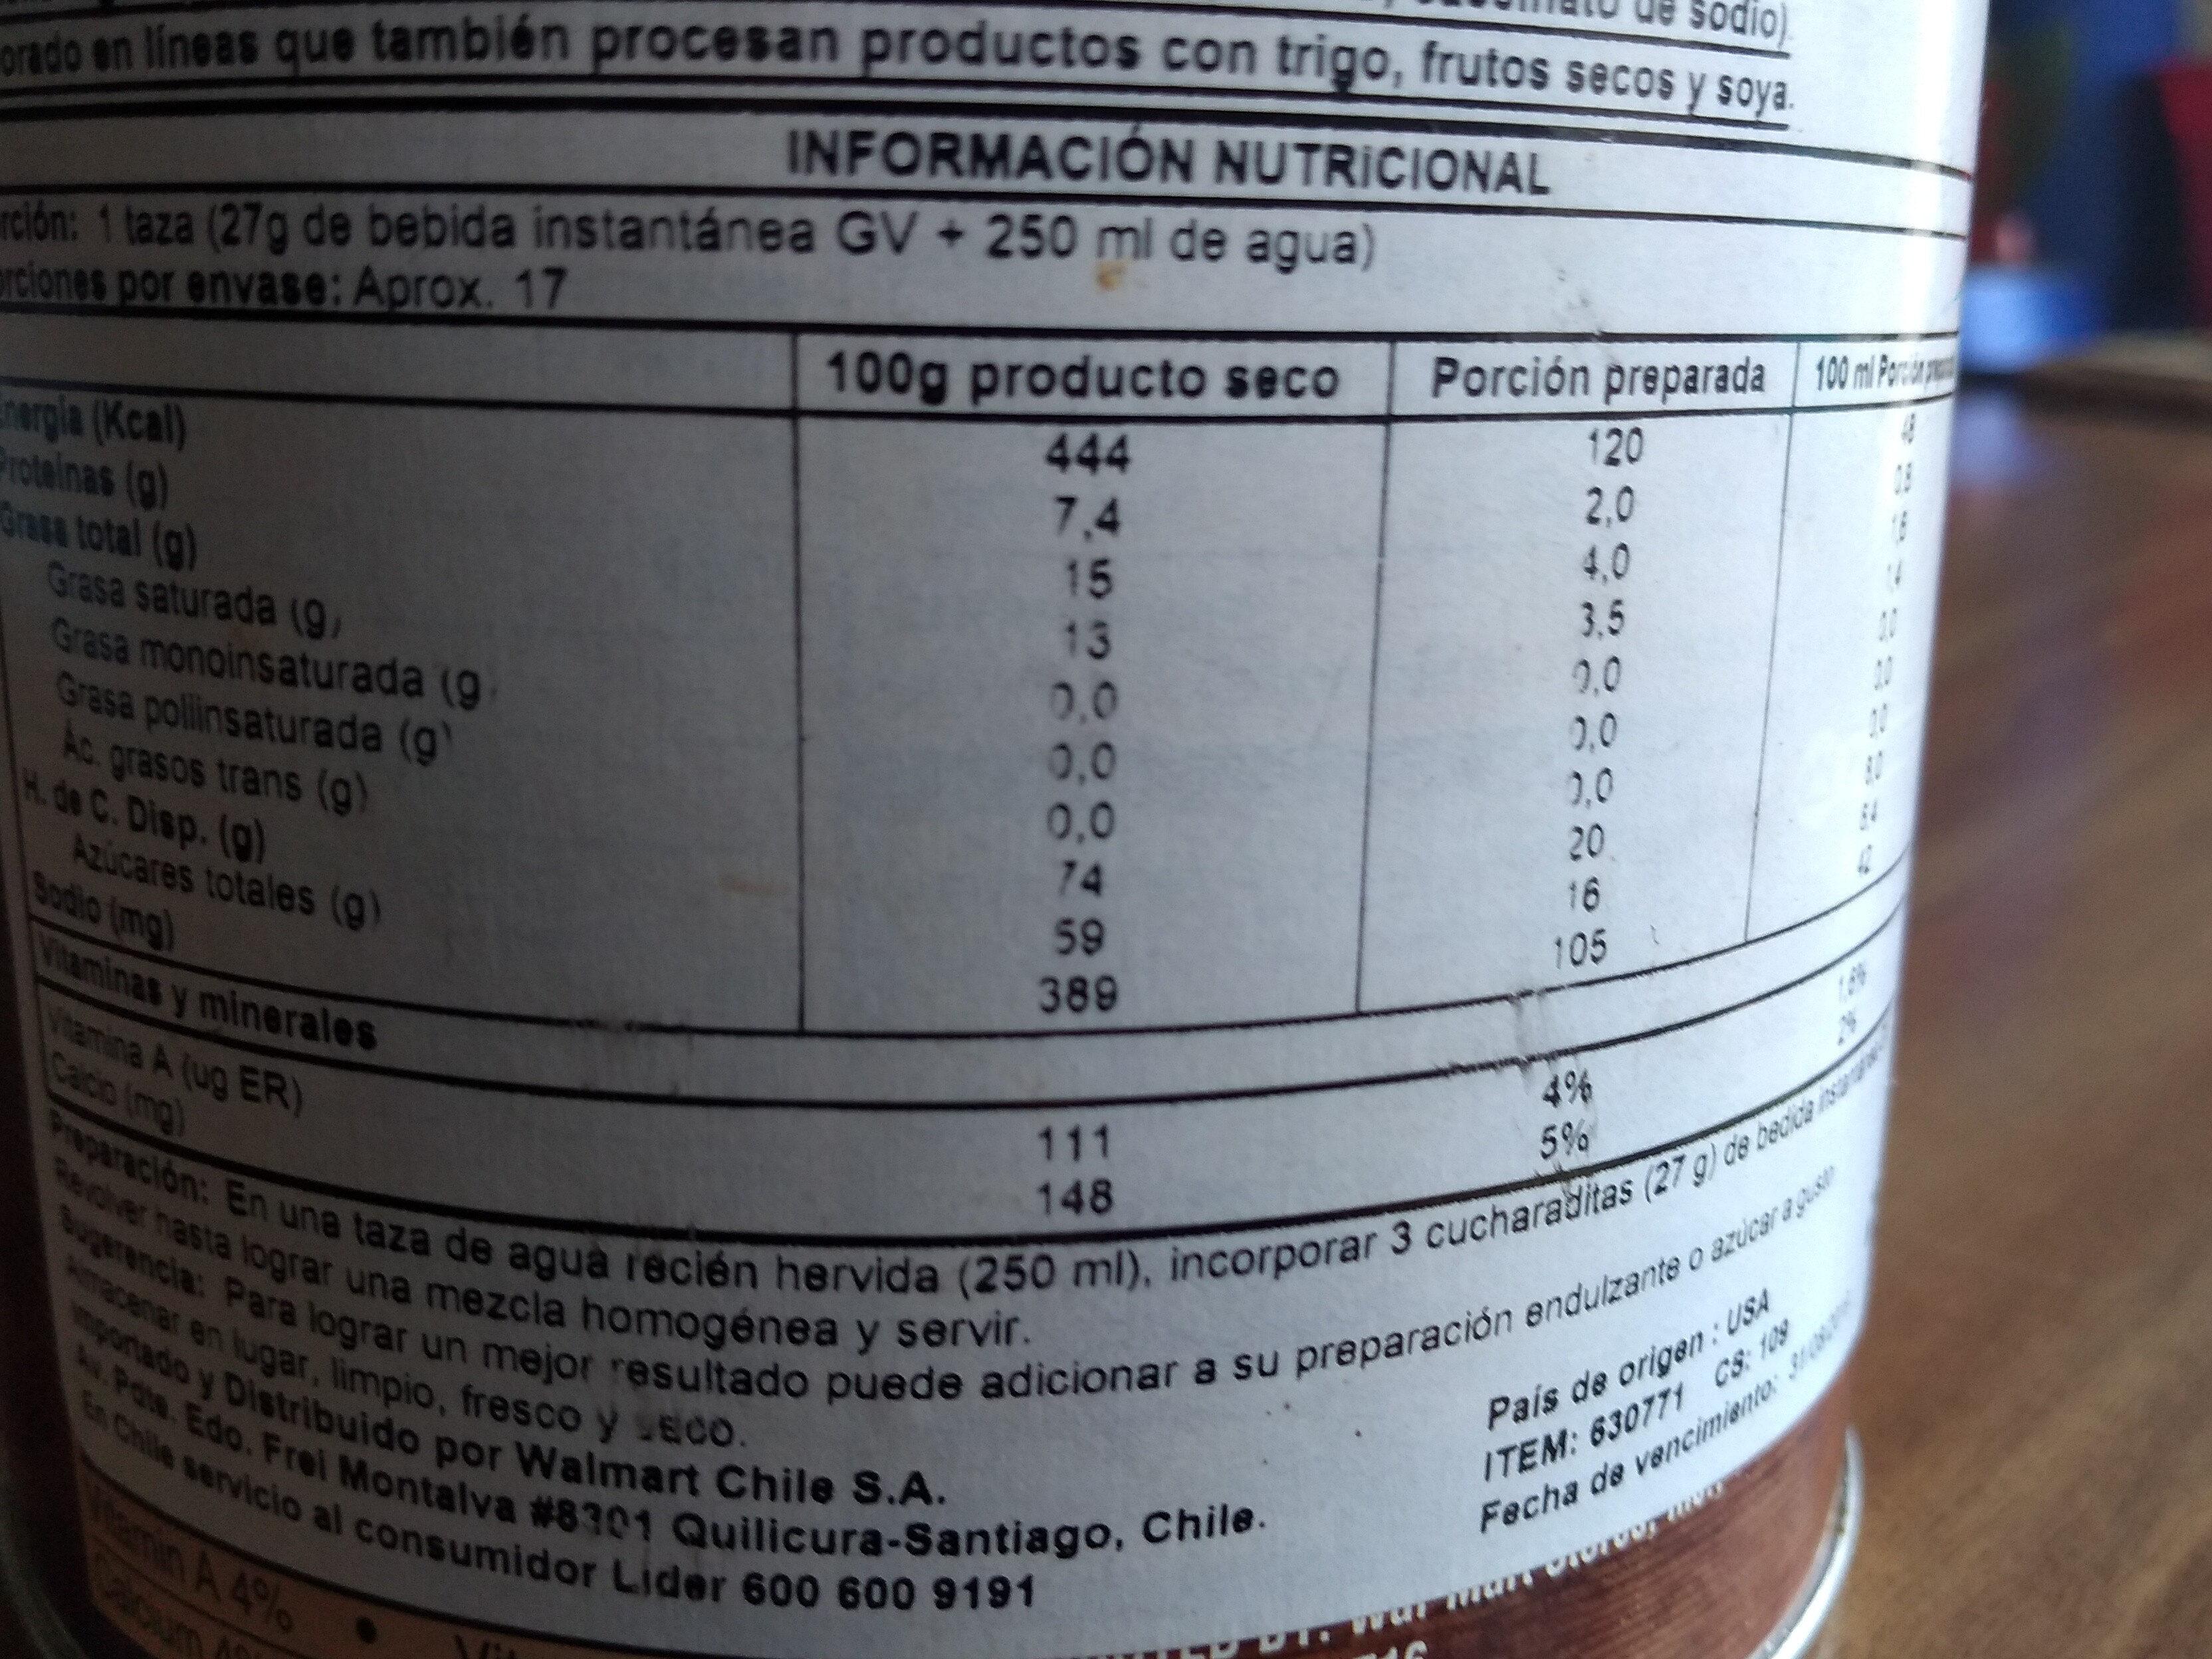 cappuccino french vanilla - Informations nutritionnelles - en